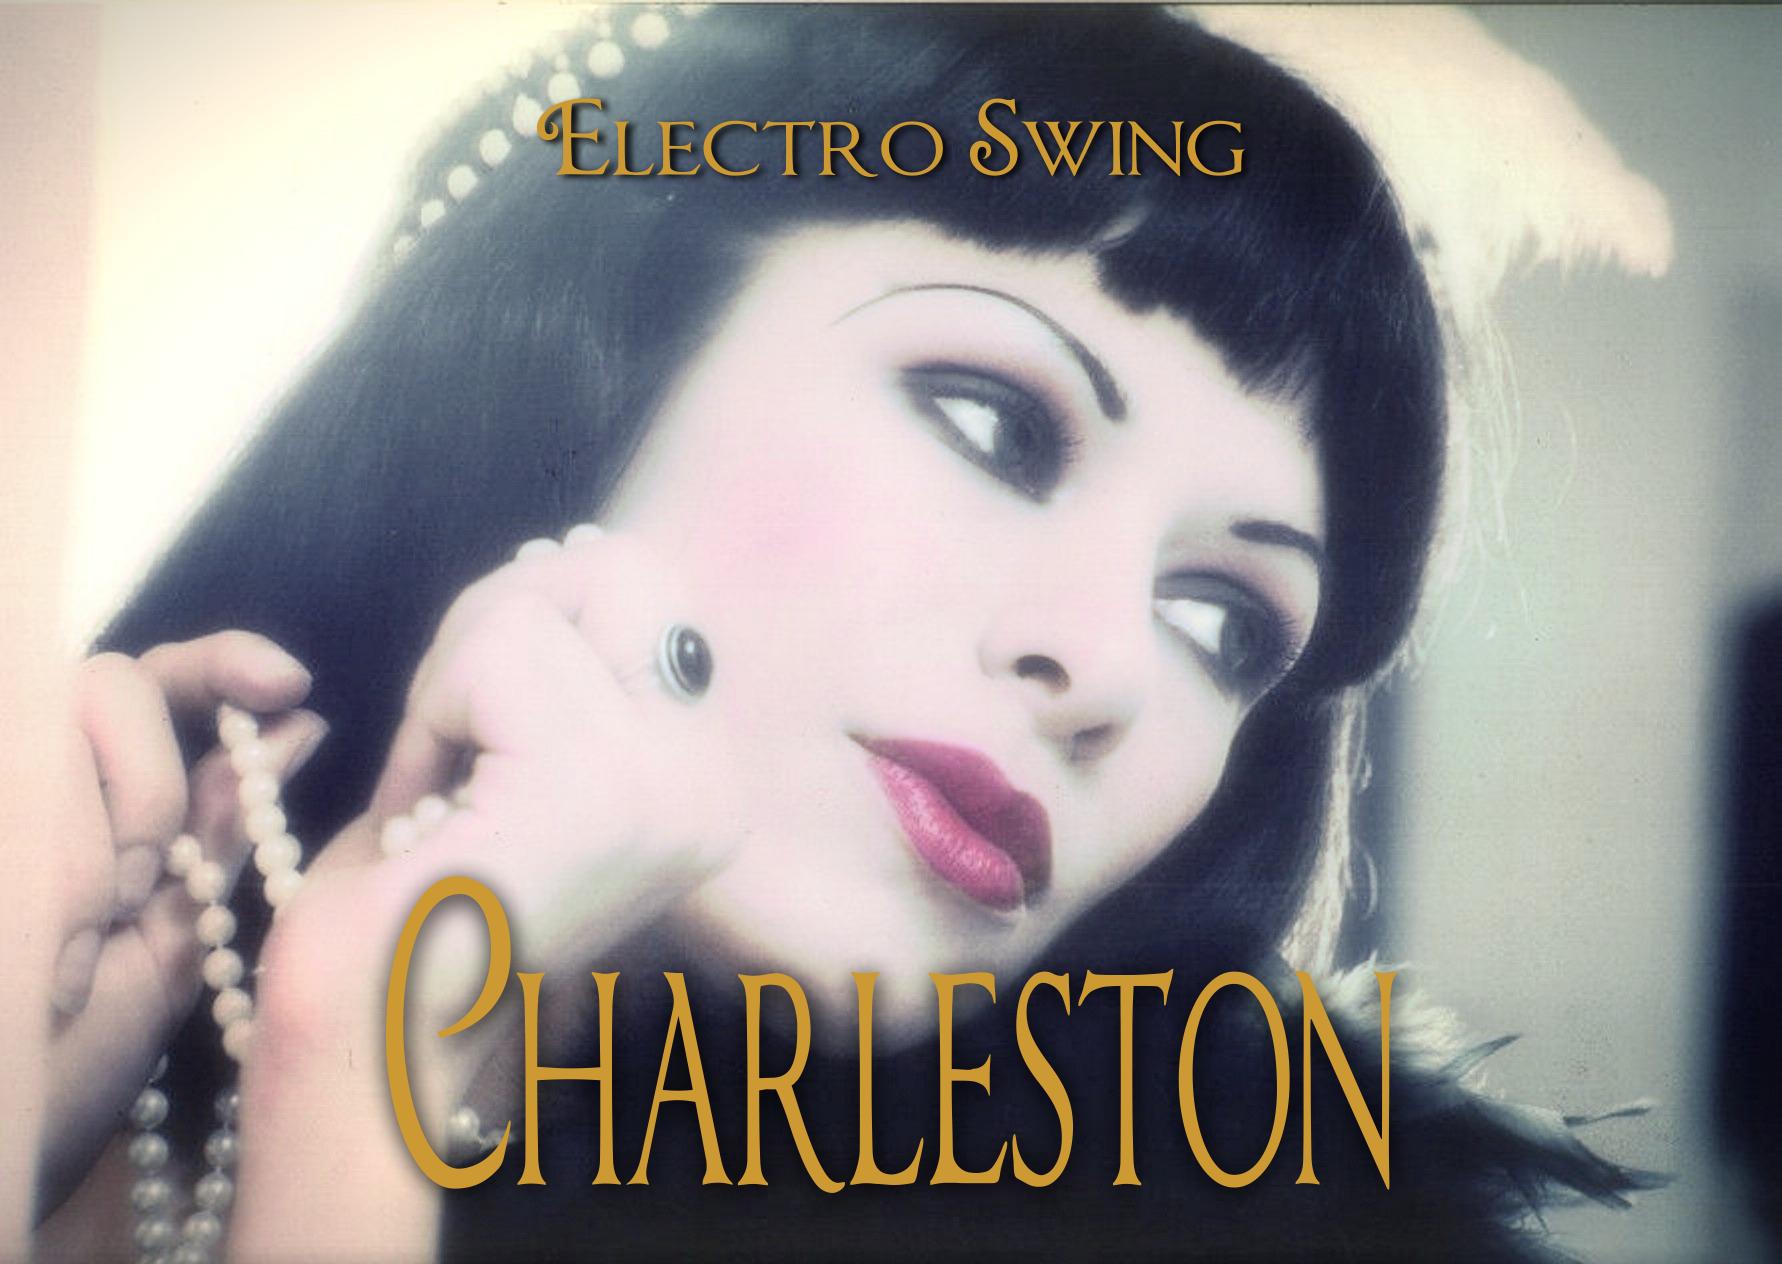 Charleston-Electro Swing